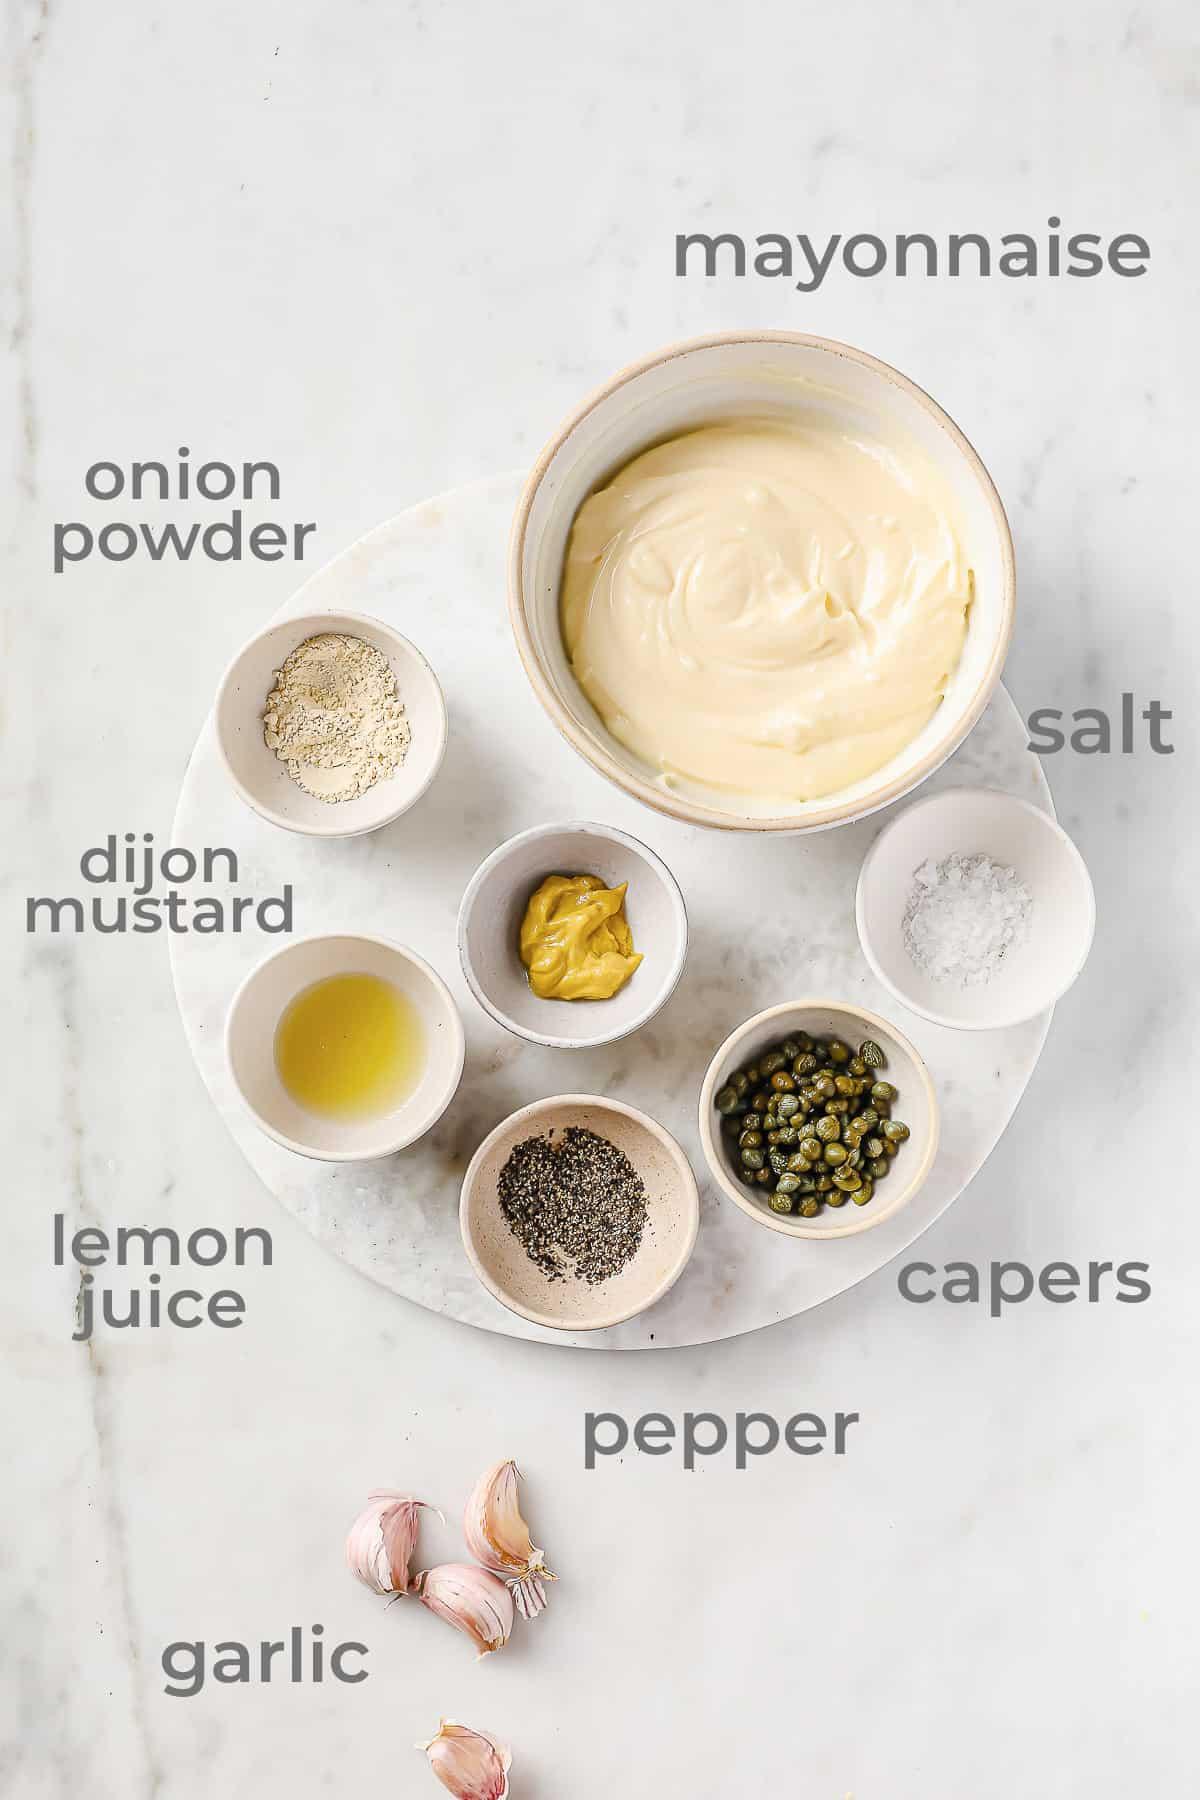 mayonnaise, dijon, garlic, onion powder, lemon juice, salt, pepper and onion powder all laid out in separate bowls